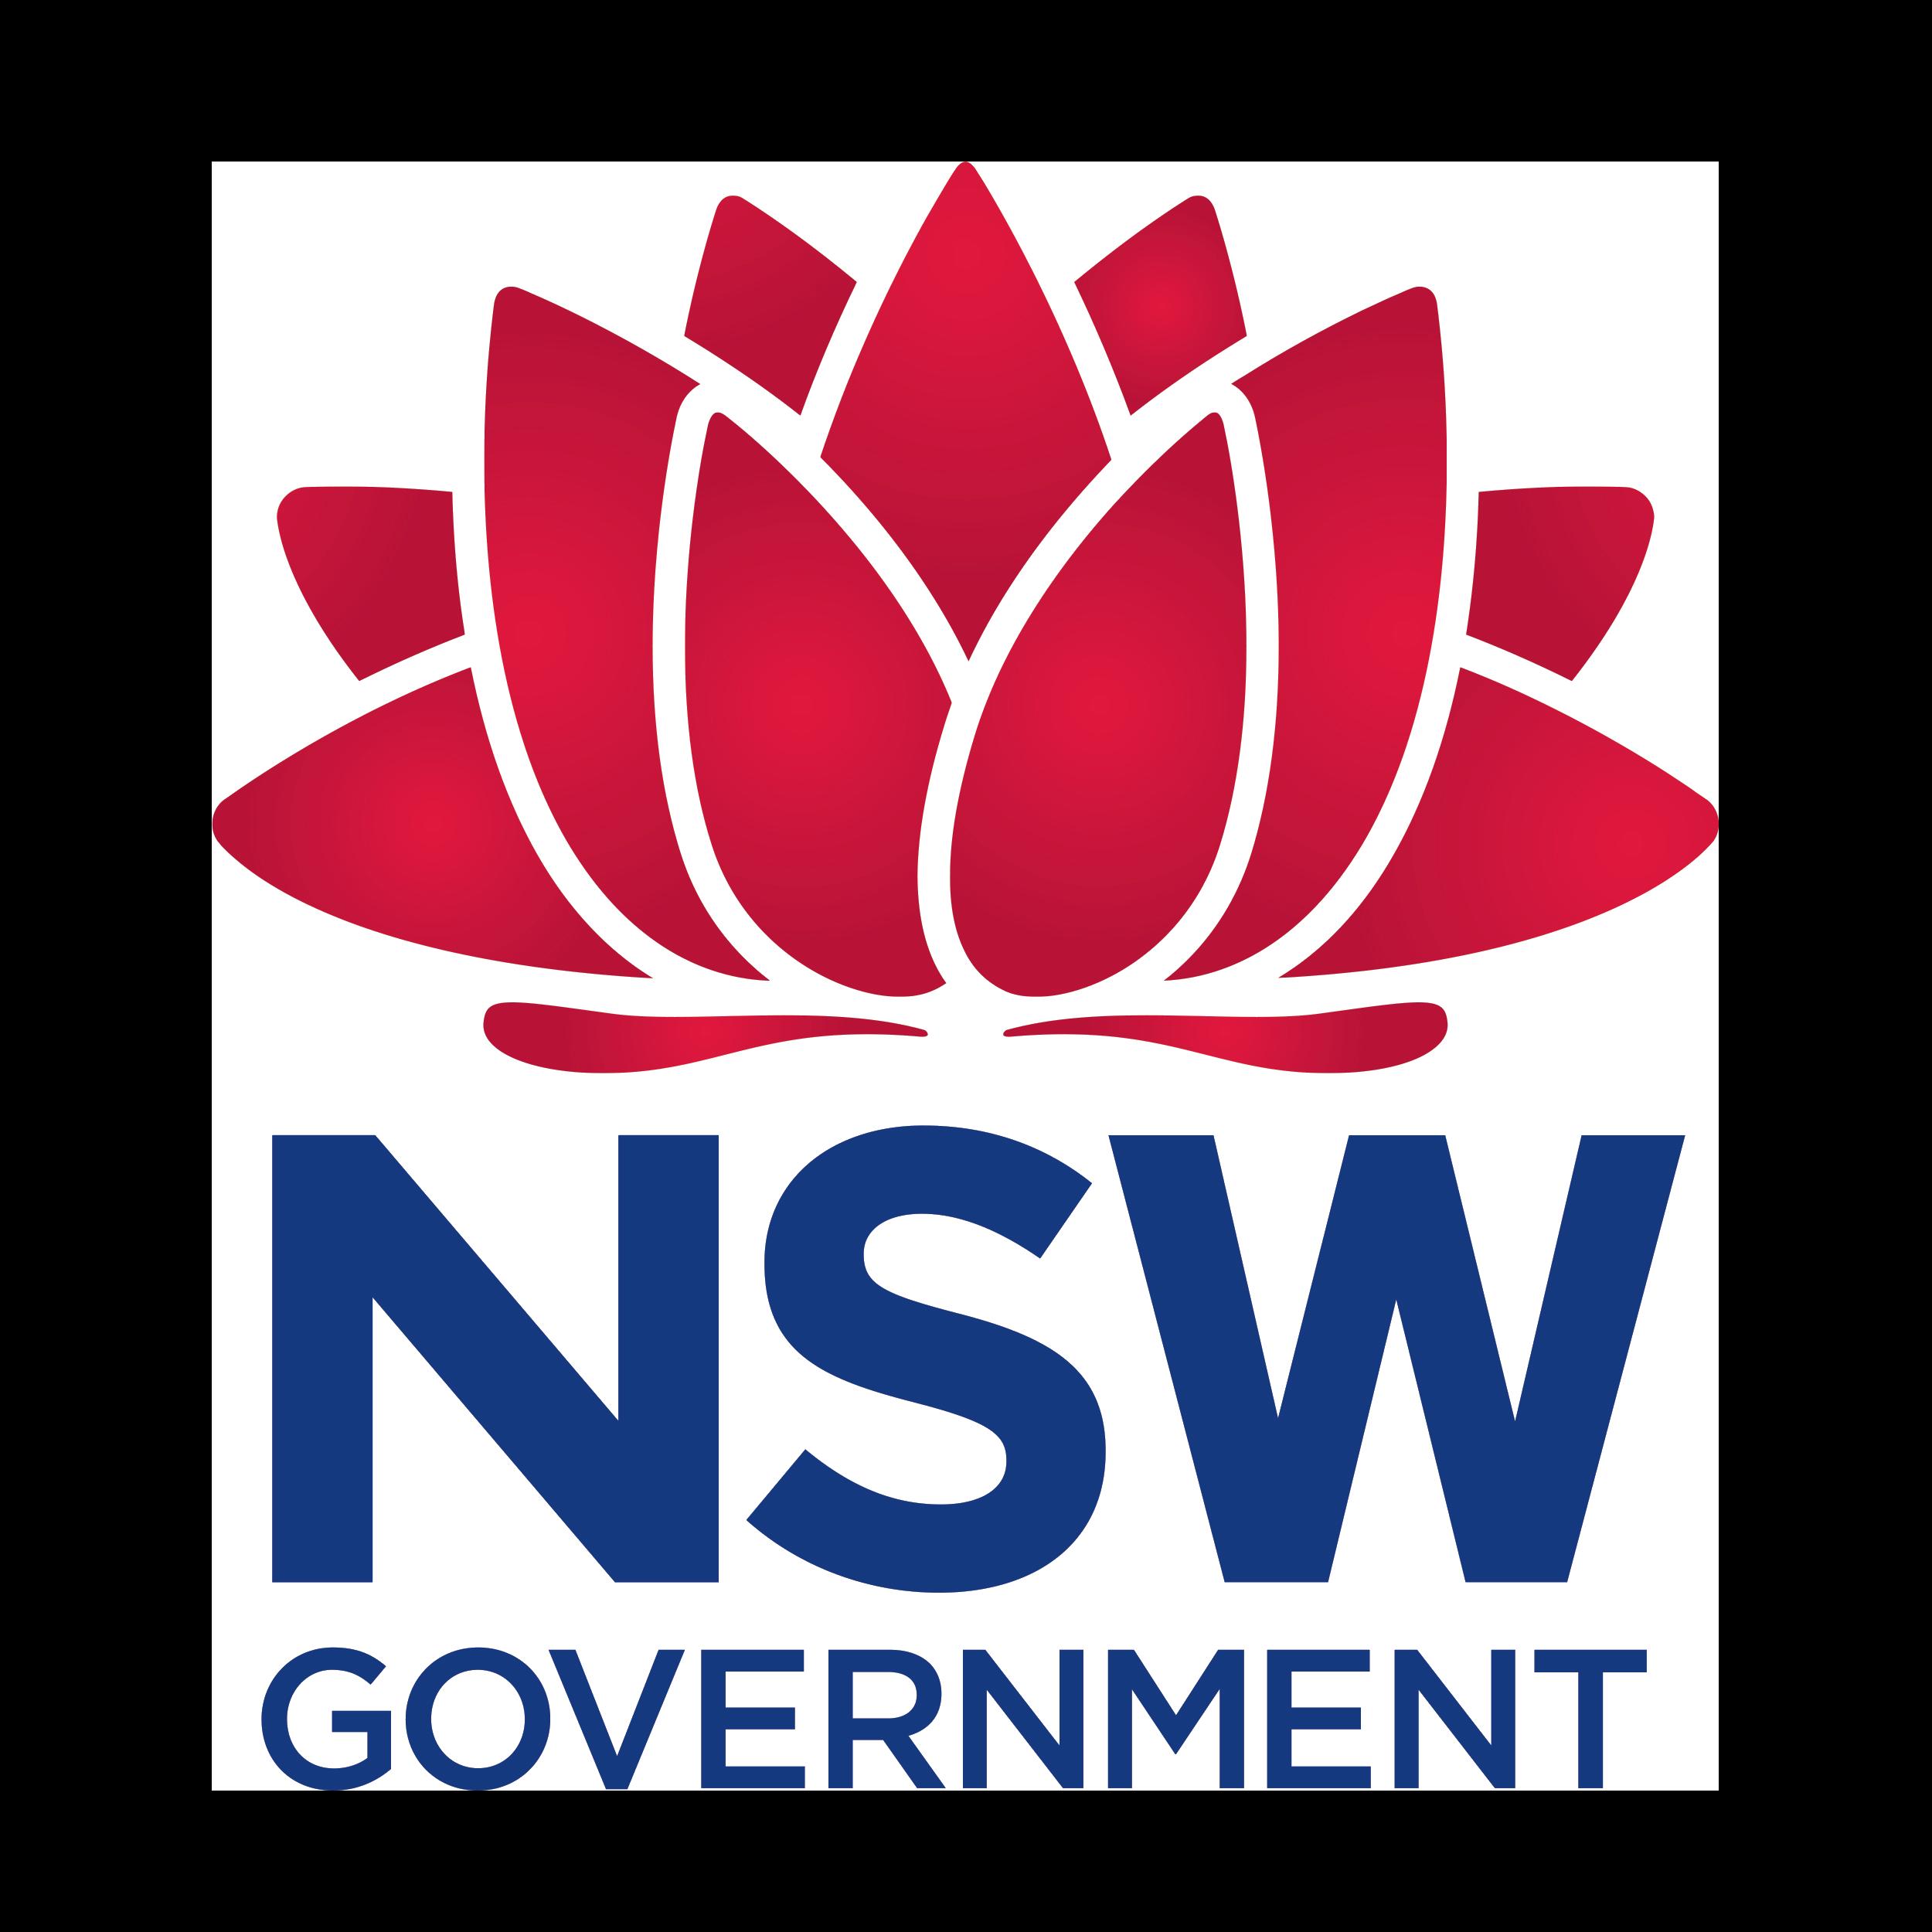 NSW Gov Logo.png